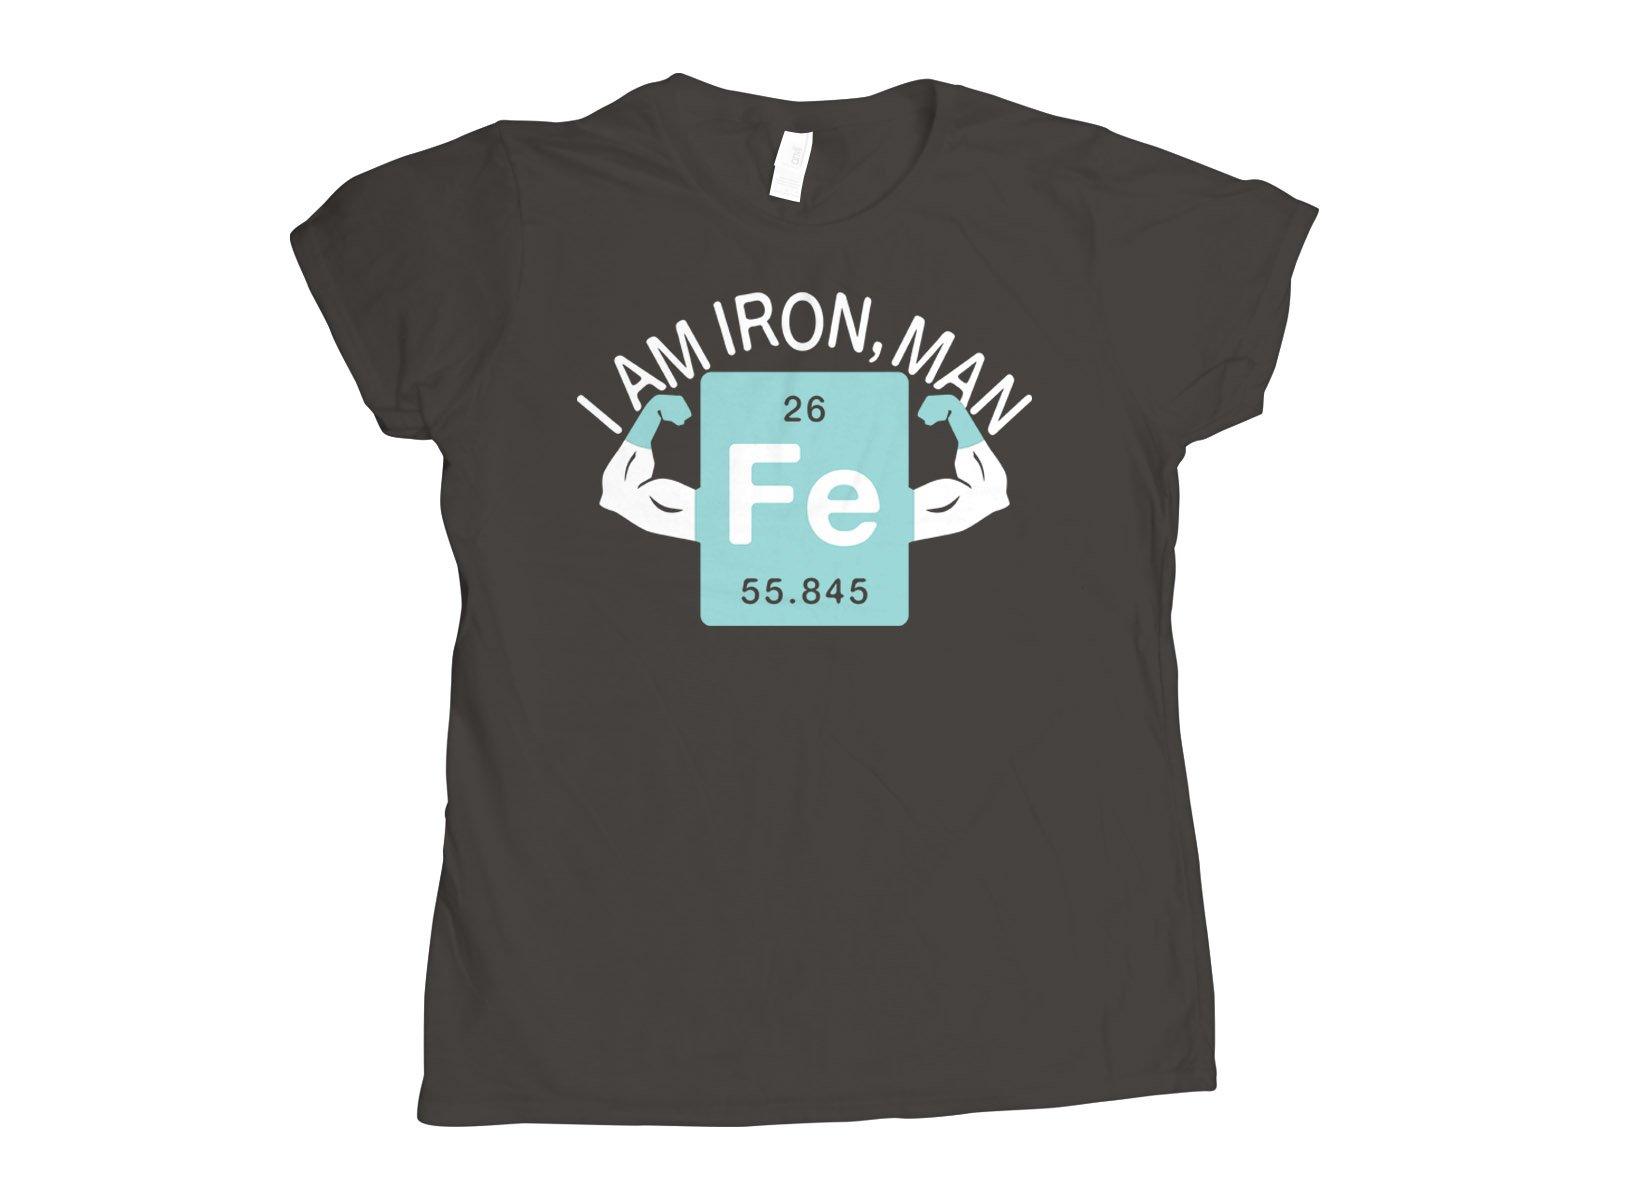 I Am Iron, Man on Womens T-Shirt